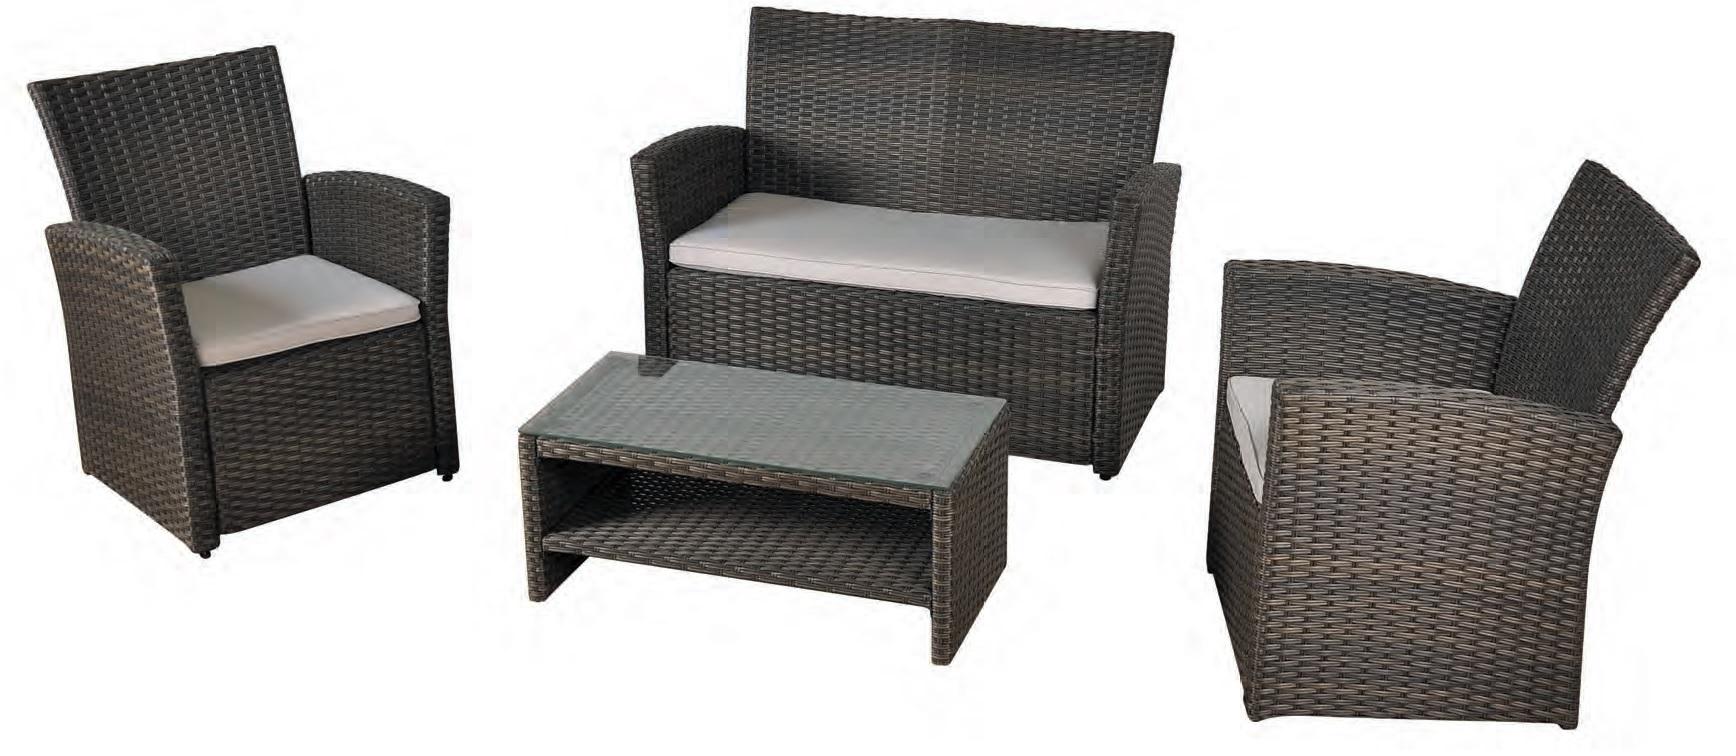 Set sofa terraza economico rattan oliver for Muebles de terraza rattan